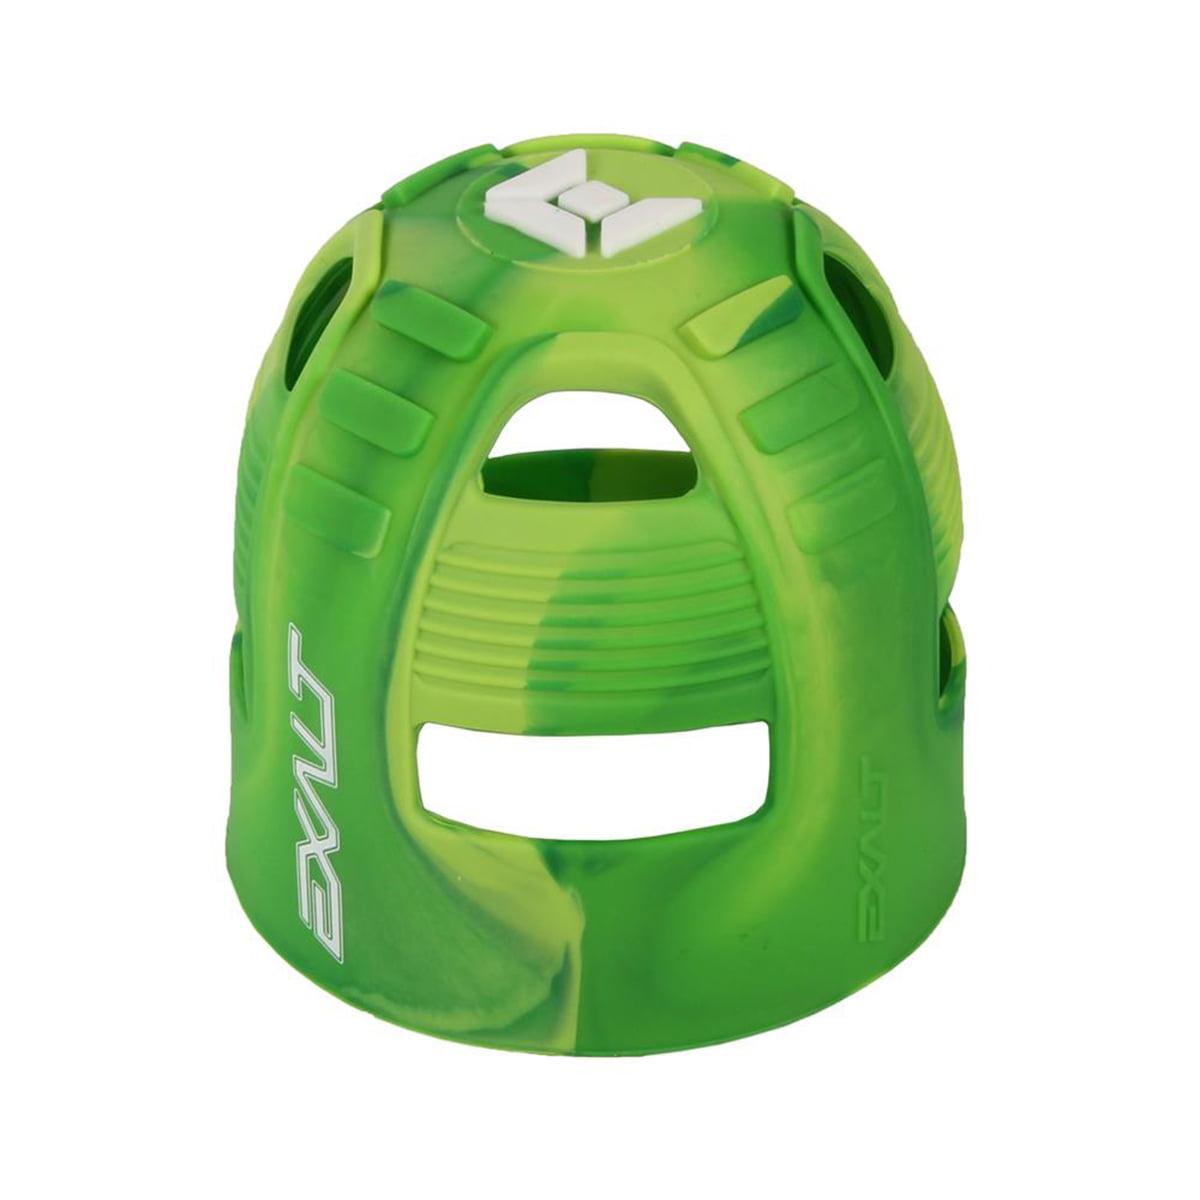 Exalt Paintball Tank Grip 45-88ci Lime Swirl by Exalt